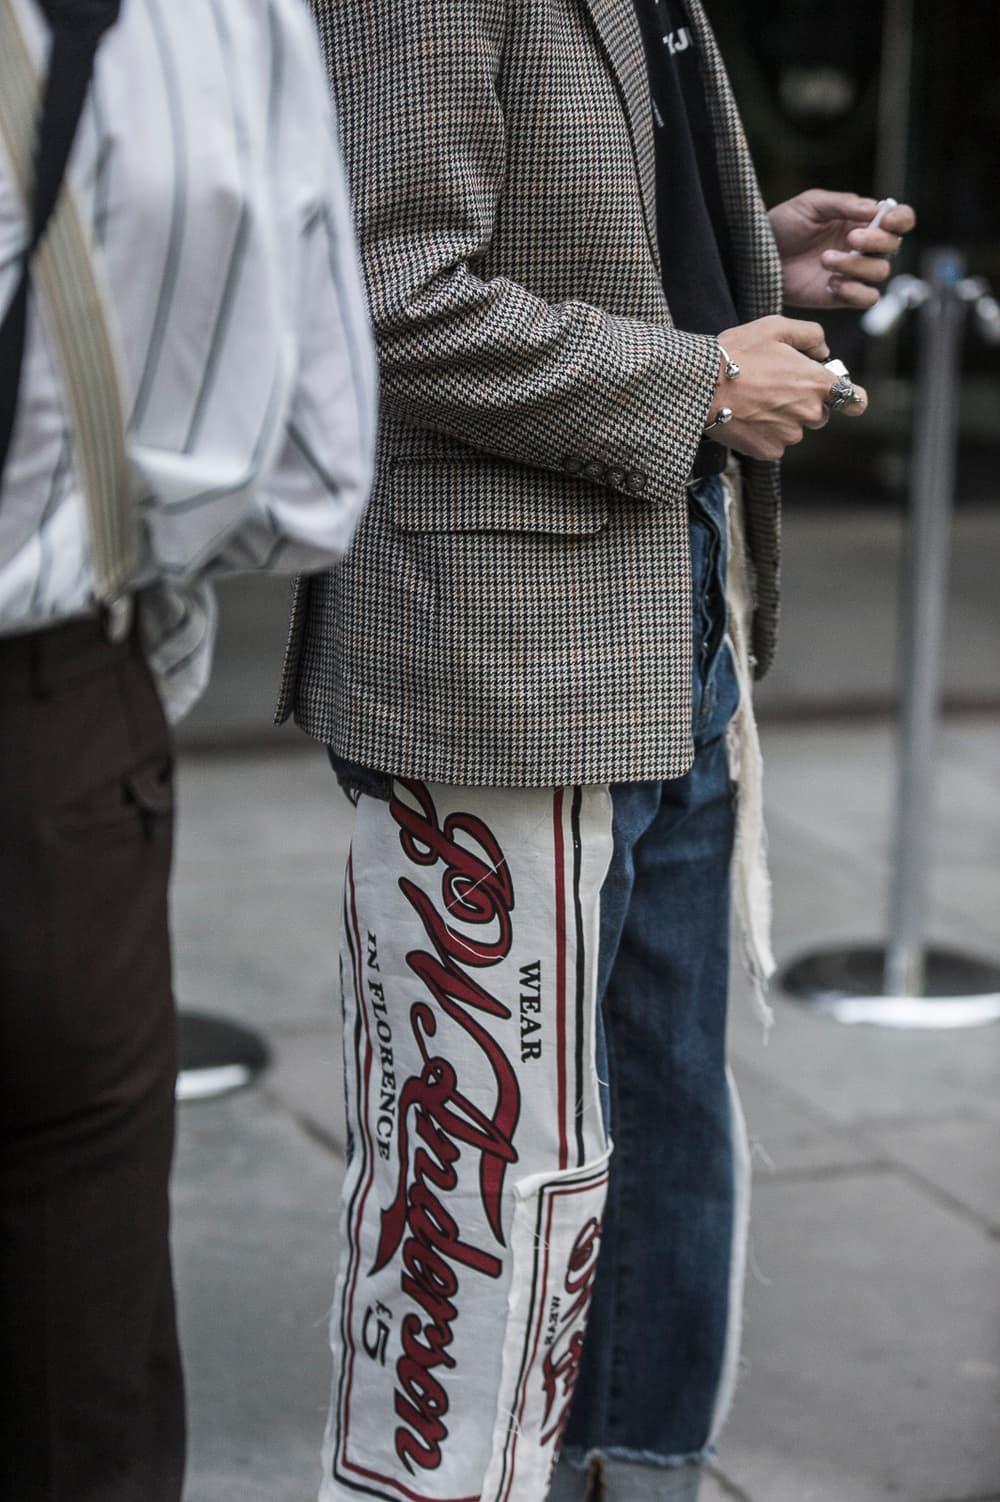 London Fashion Week Men's Spring/Summer 2019 SS19 Street Style Snaps Balenciaga Burberry Liam Hodges A-COLD-WALL* J.W. Anderson Raf SImons Dior Homme B22 Triple S Nike Air Monarch